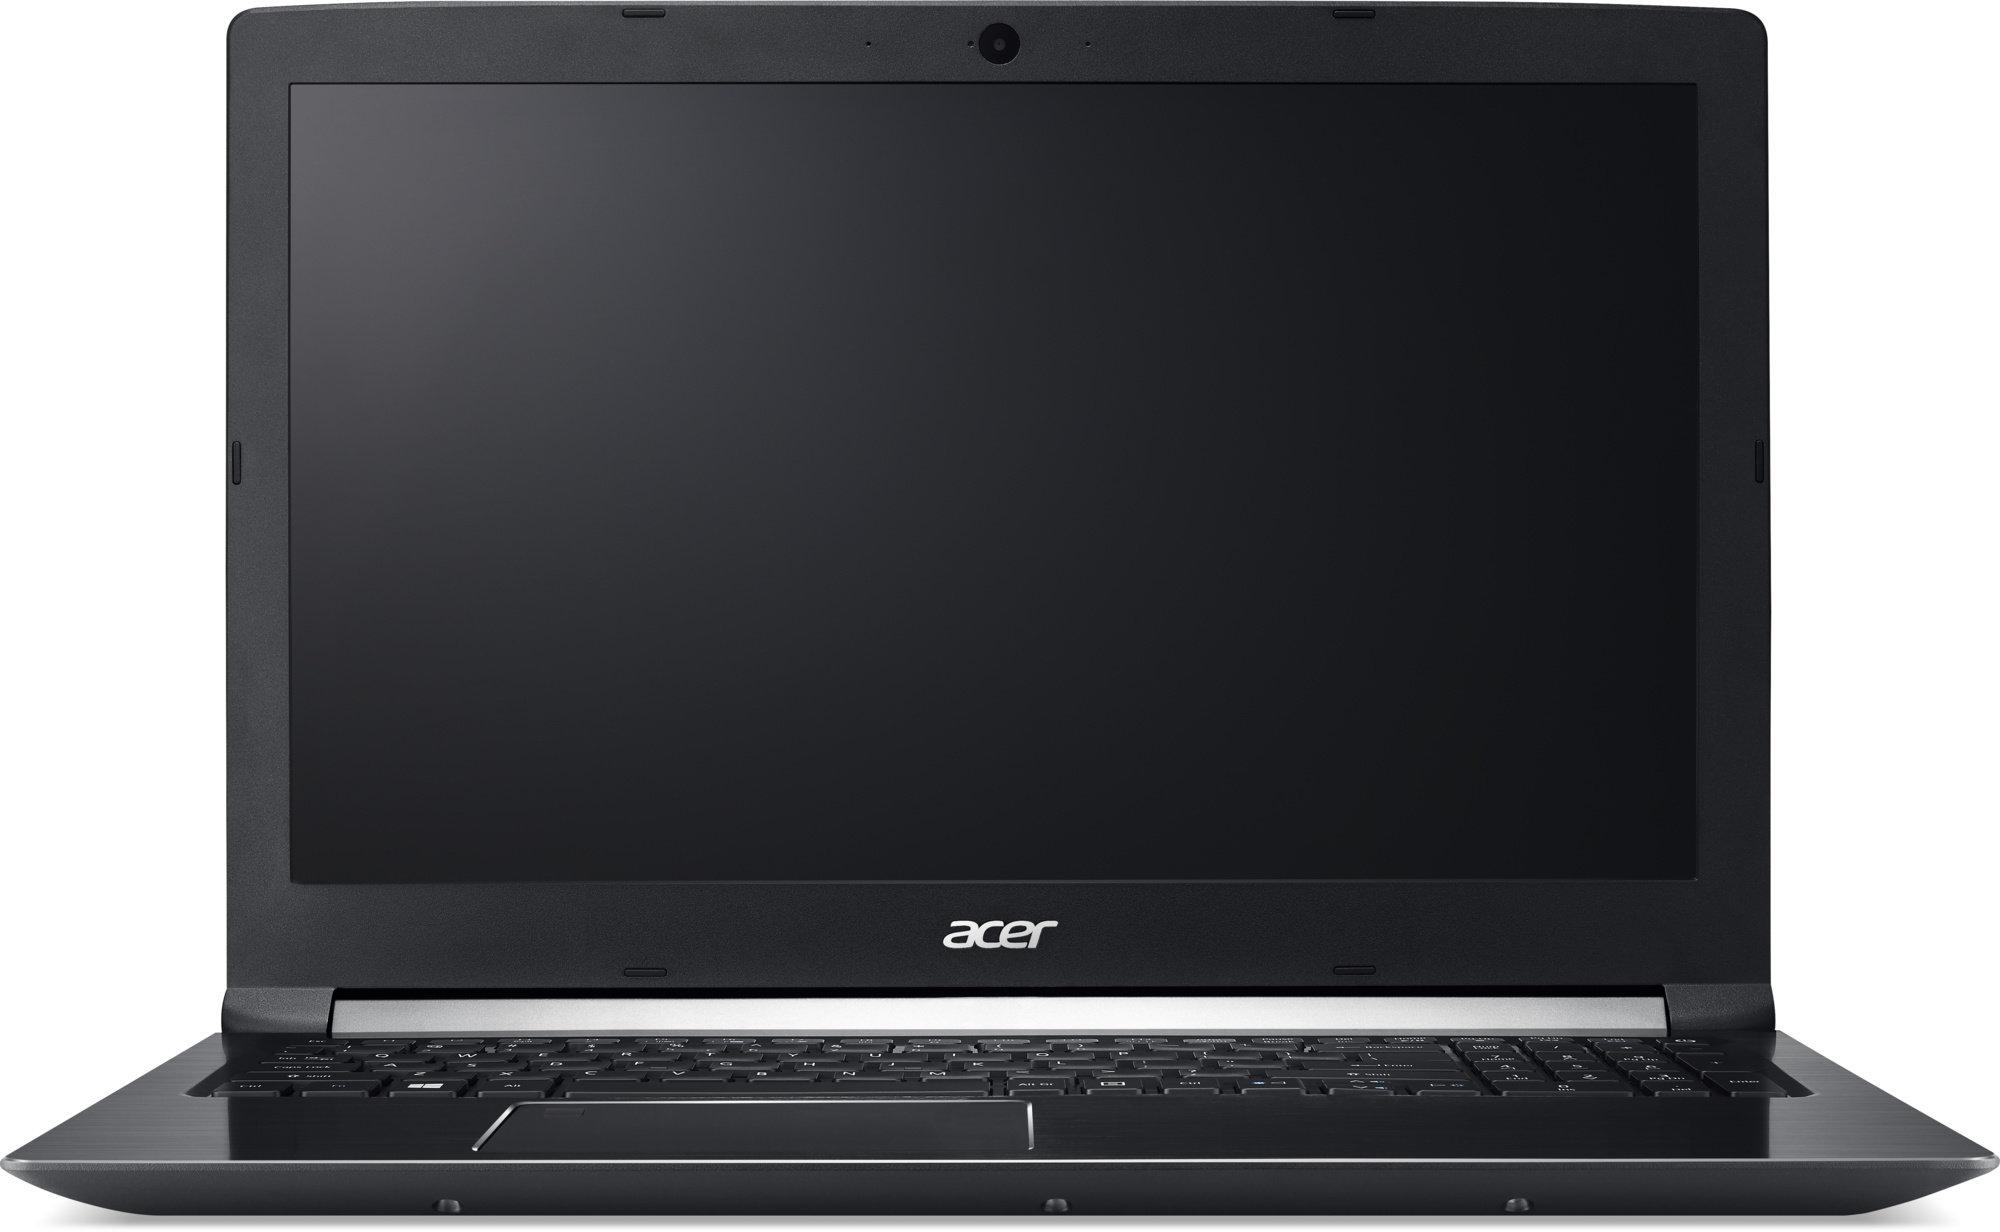 "Acer Aspire 7 (A715-71G-70C0) i7-7700HQ/8 GB+N/256GB SSD M.2+1TB/GTX 1050Ti 4GB/15.6"" FHD LED LCD matný/BT/W10Home/Black"